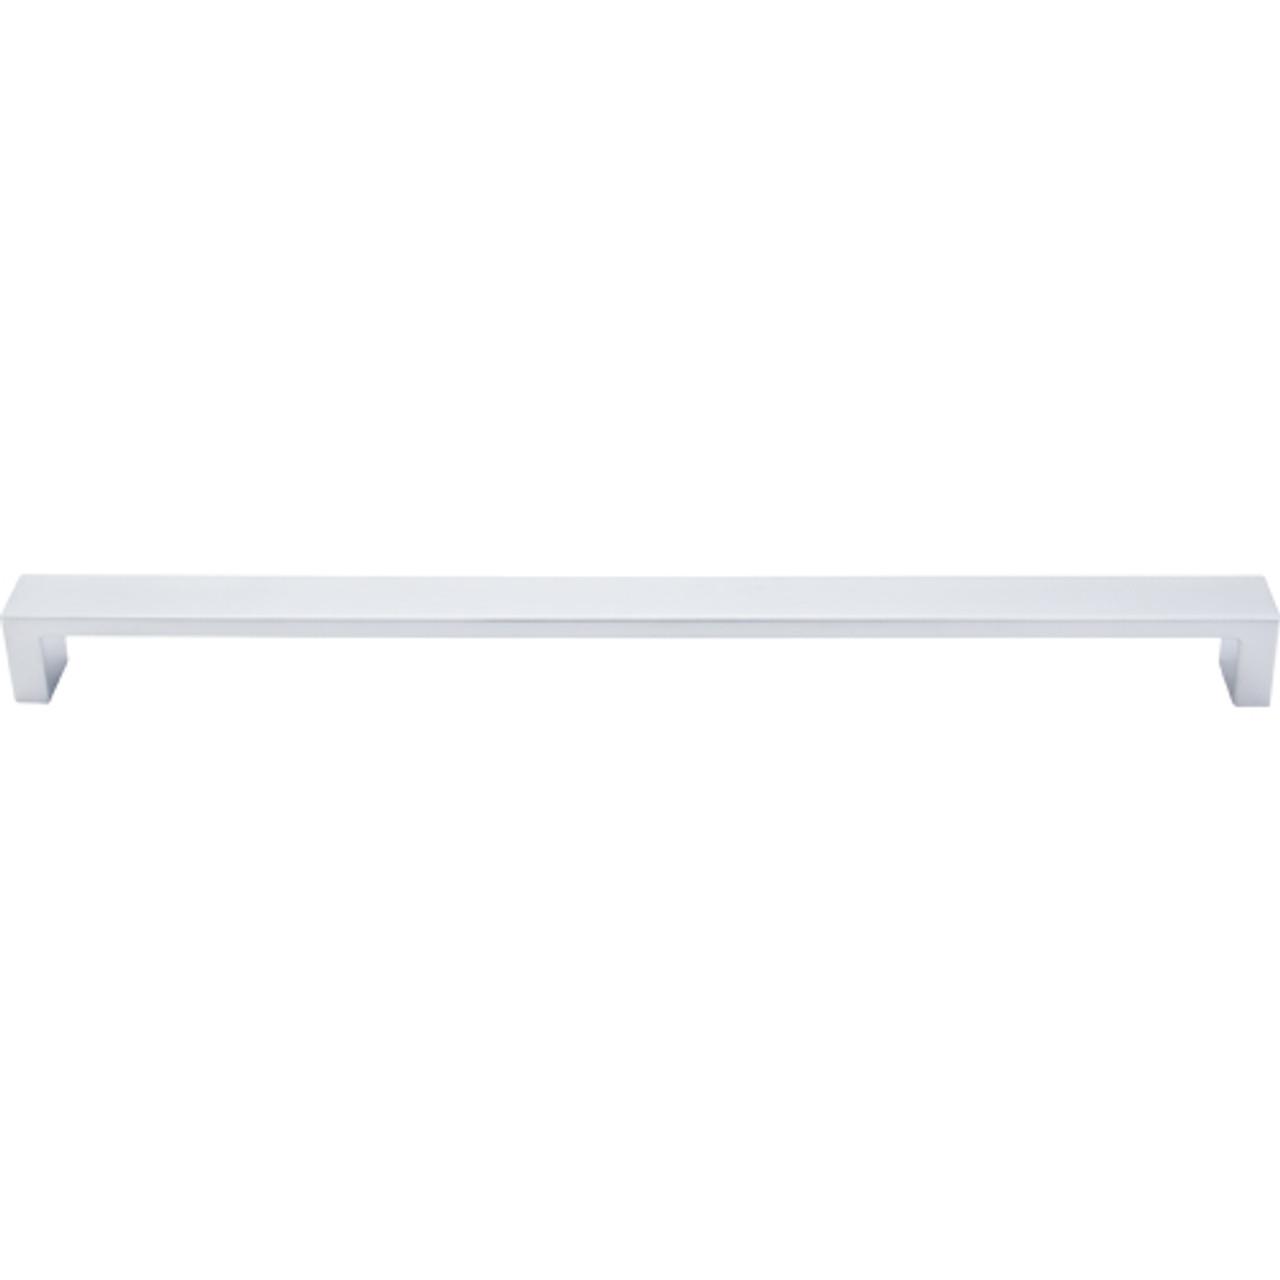 "Top Knobs - Modern Metro Pull 12"" (c-c) - Aluminum (TKTK253ALU)"